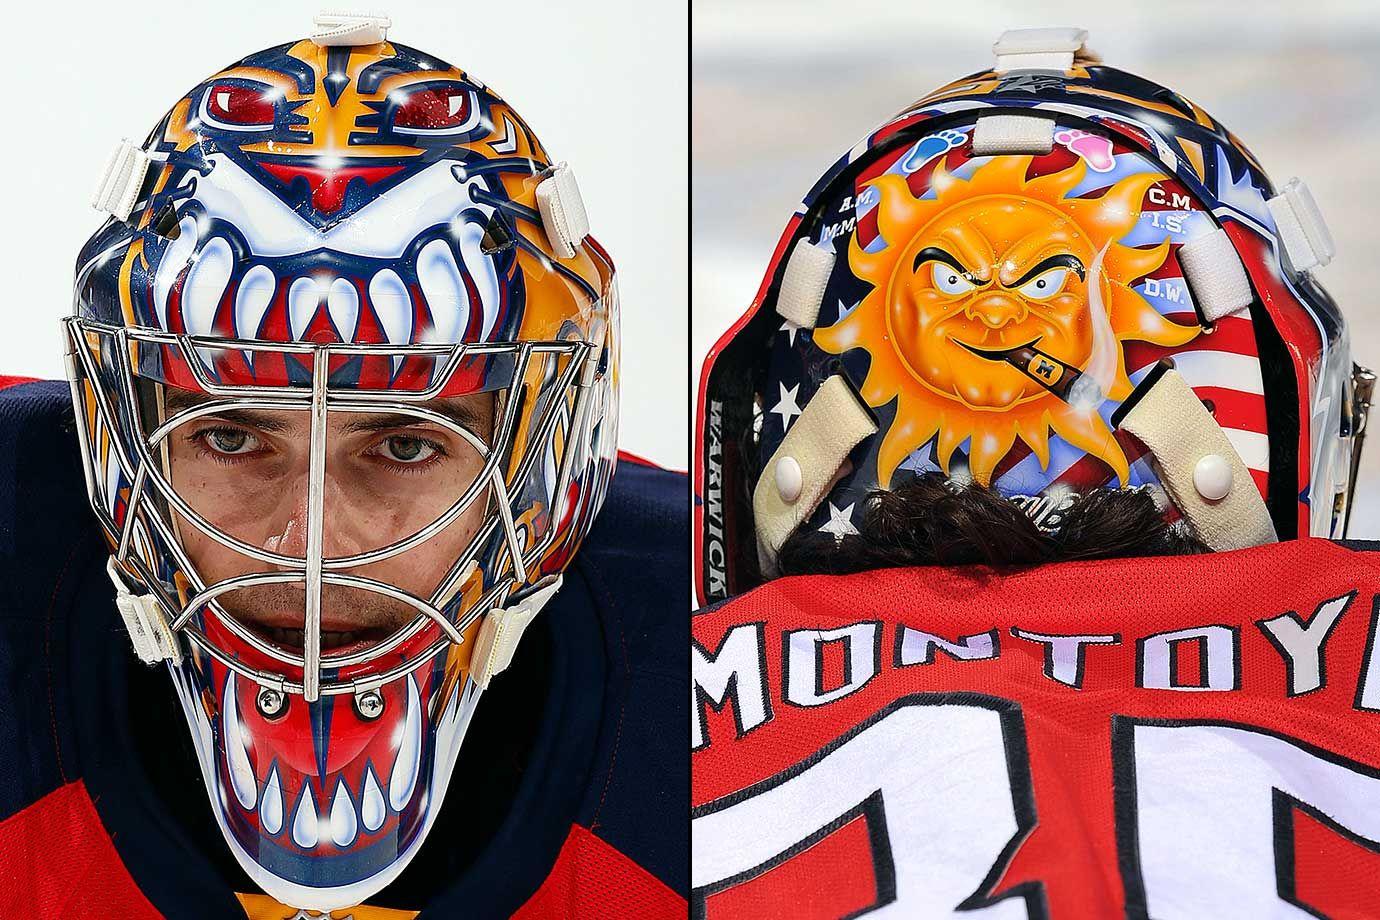 NHL Goalie Masks by Team (2016) | Hockey Goalie Masks